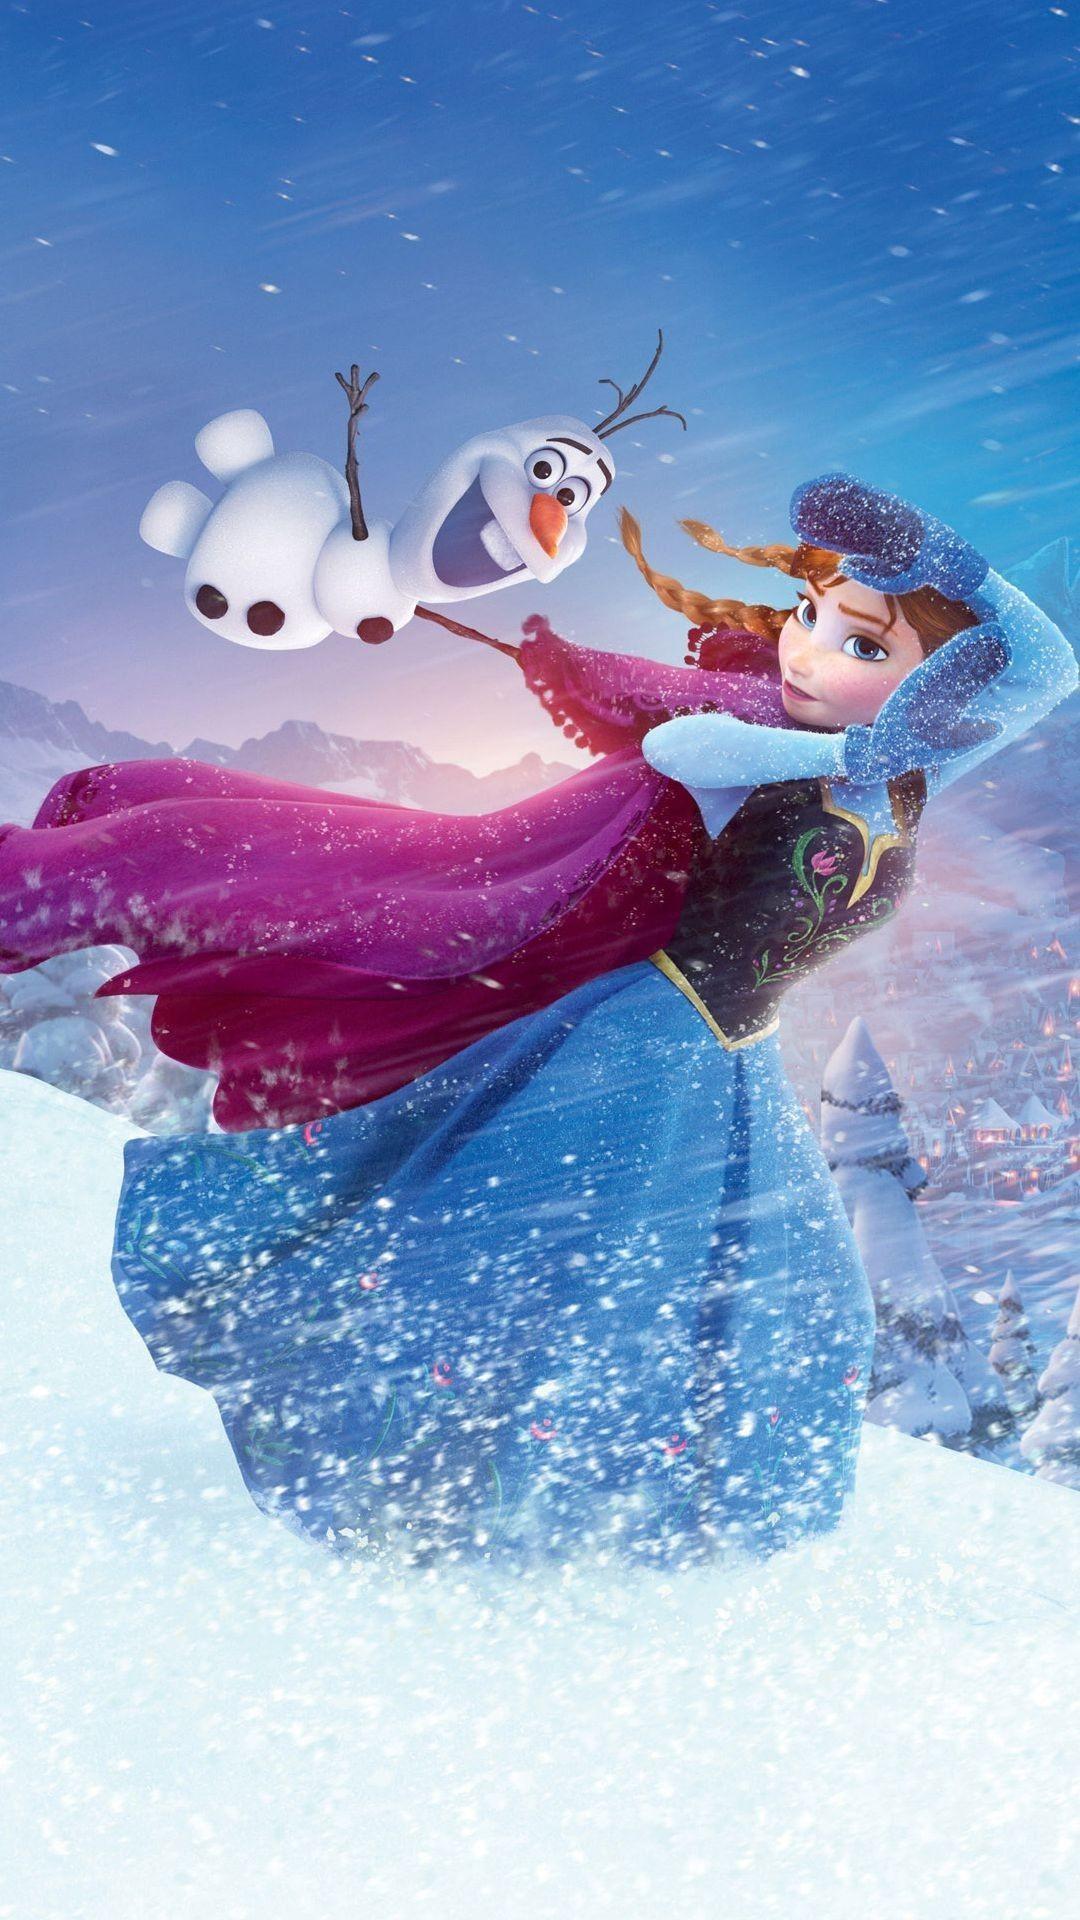 Res: 1080x1920, 2014 Halloween Frozen Anna Olaf iPhone 6 plus Wallpaper - Disney Wonderland  Cartoons